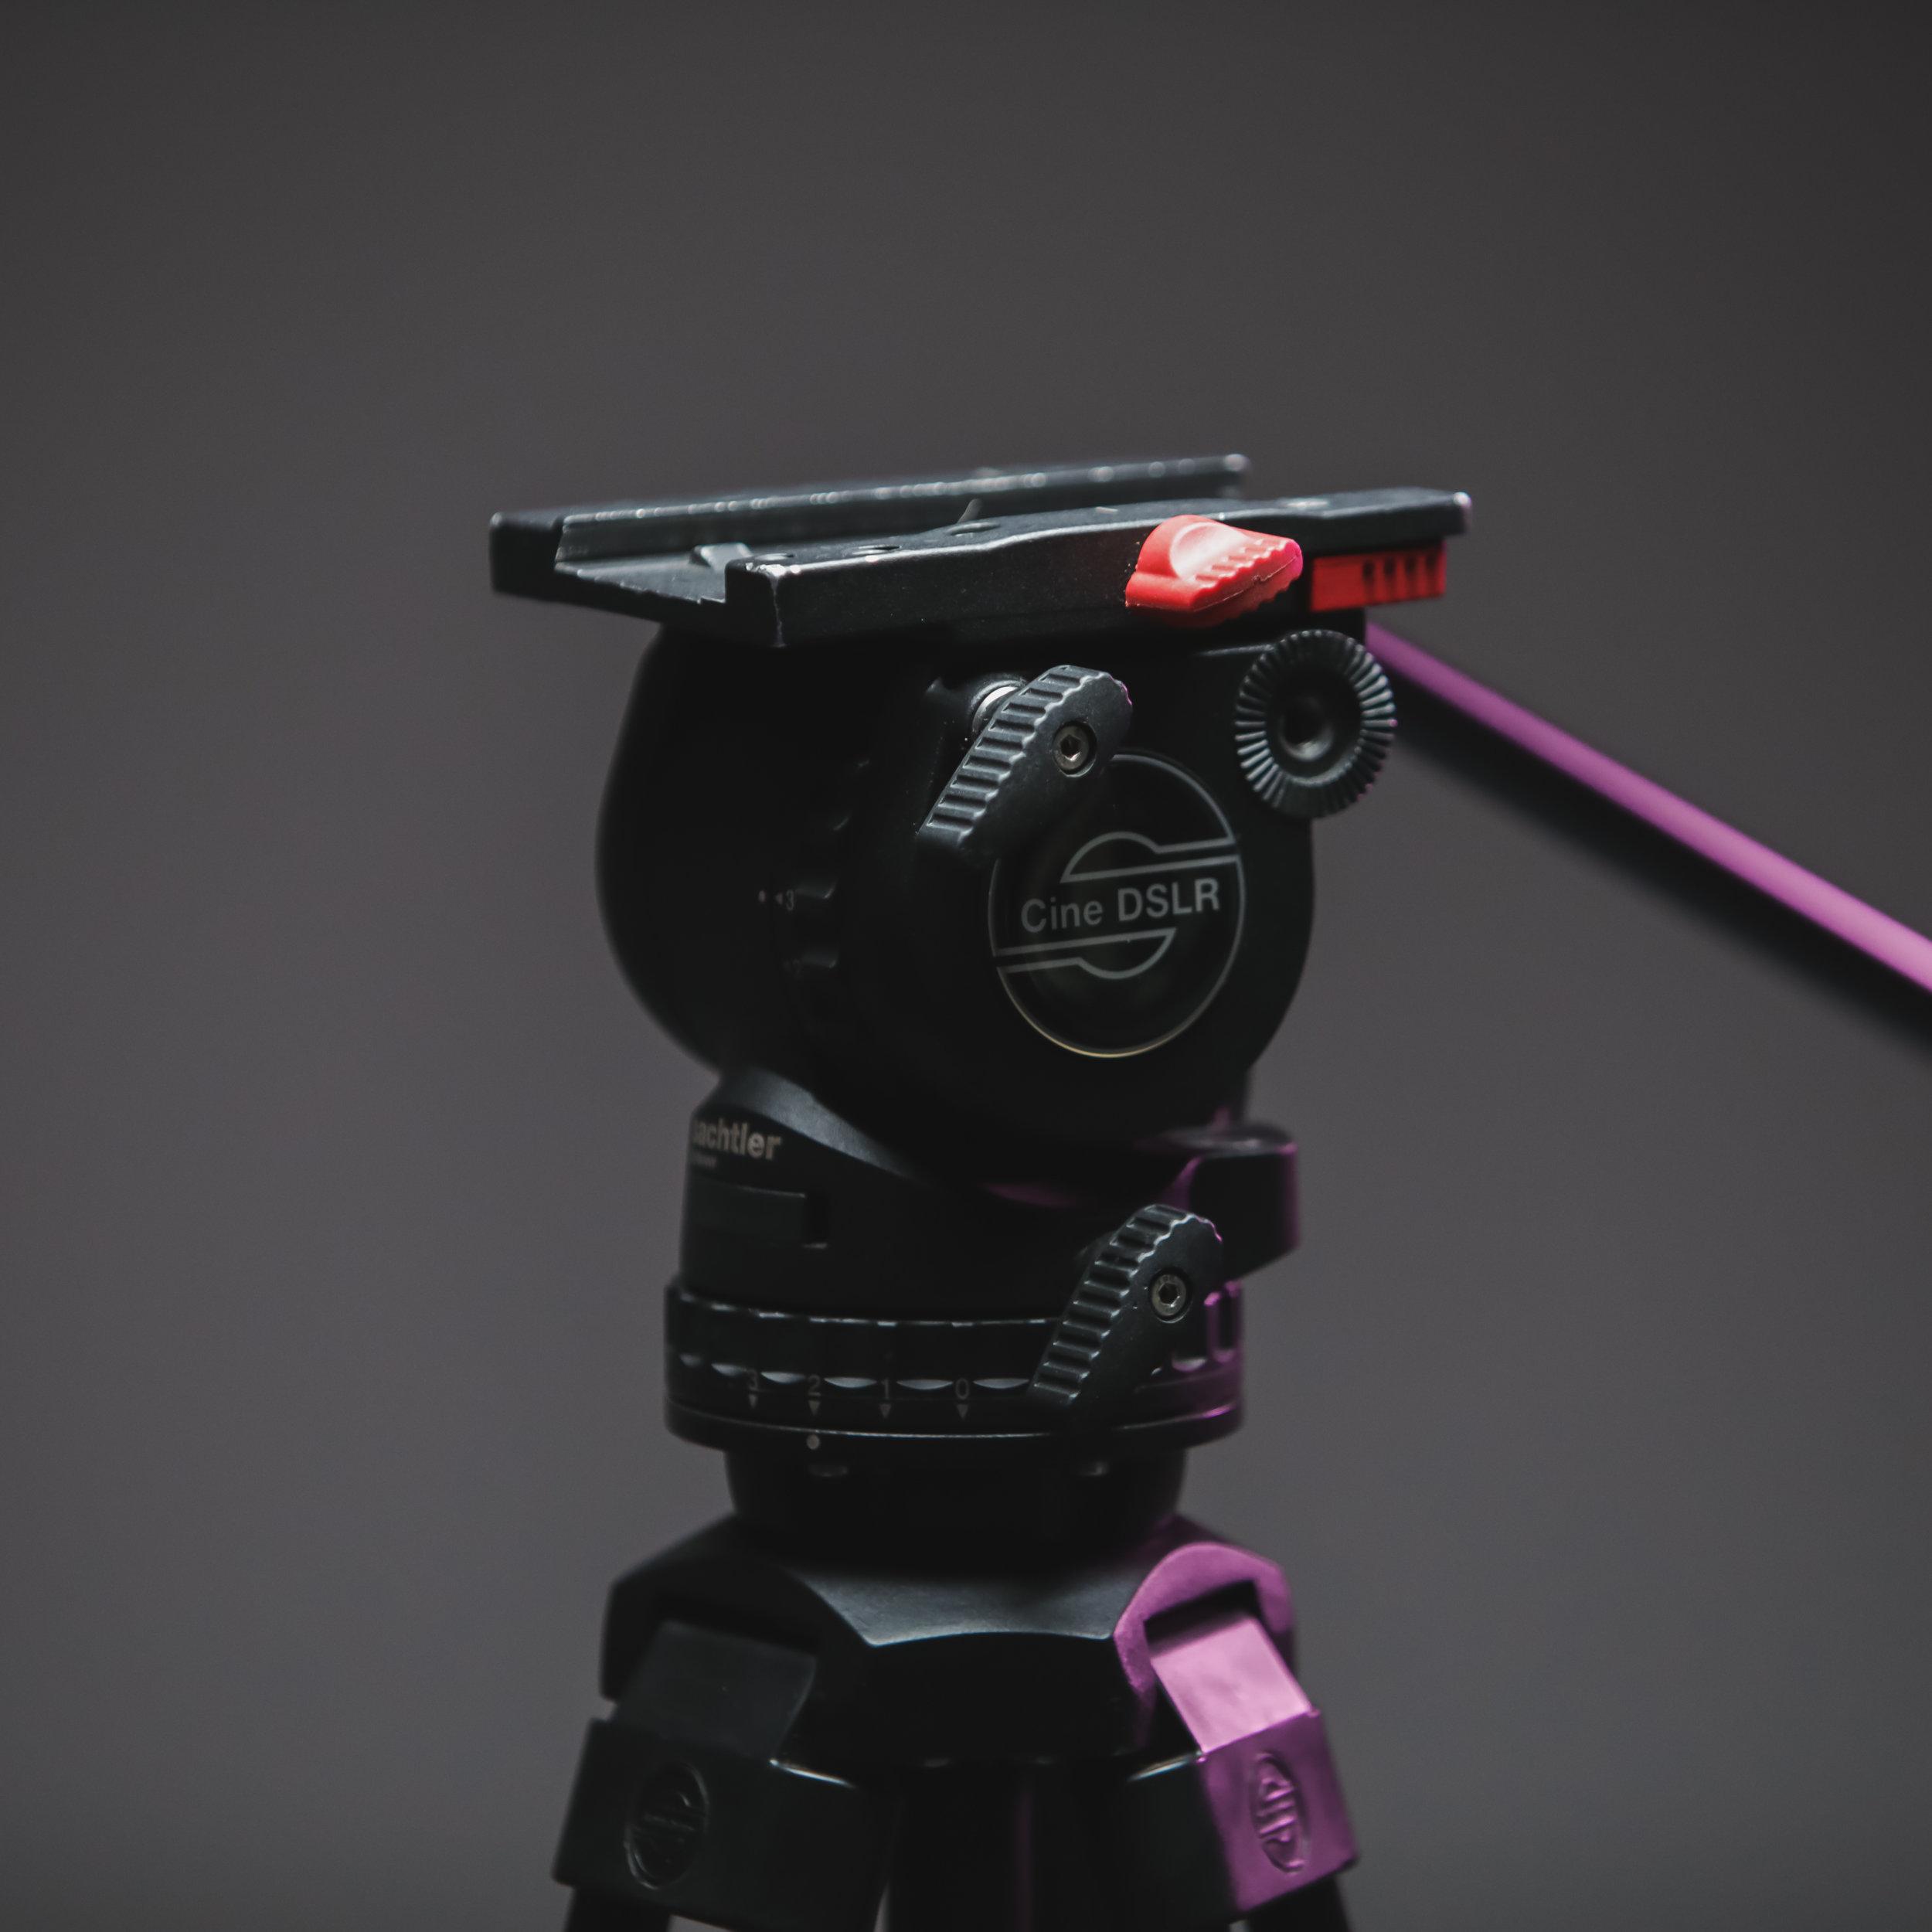 Sachtler Cine DSLR Fluid Head Tripod